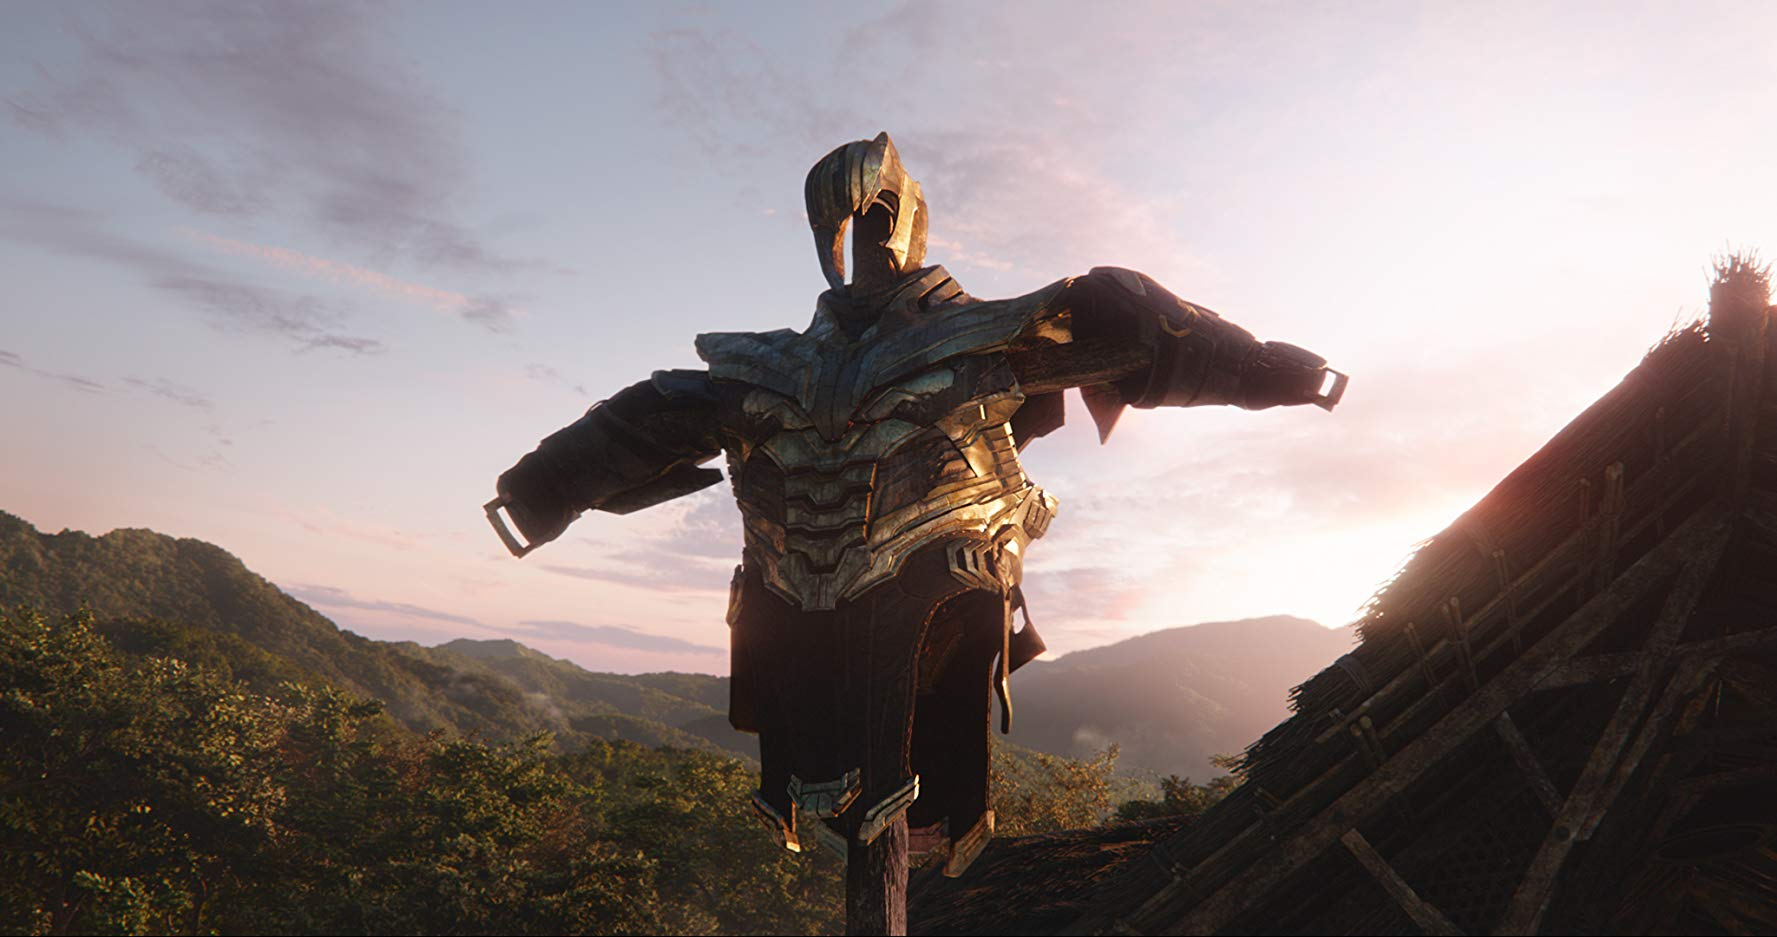 Avengers: Endgame – Quick Review – Narrative Gambles, Epic Battles, Saga's End